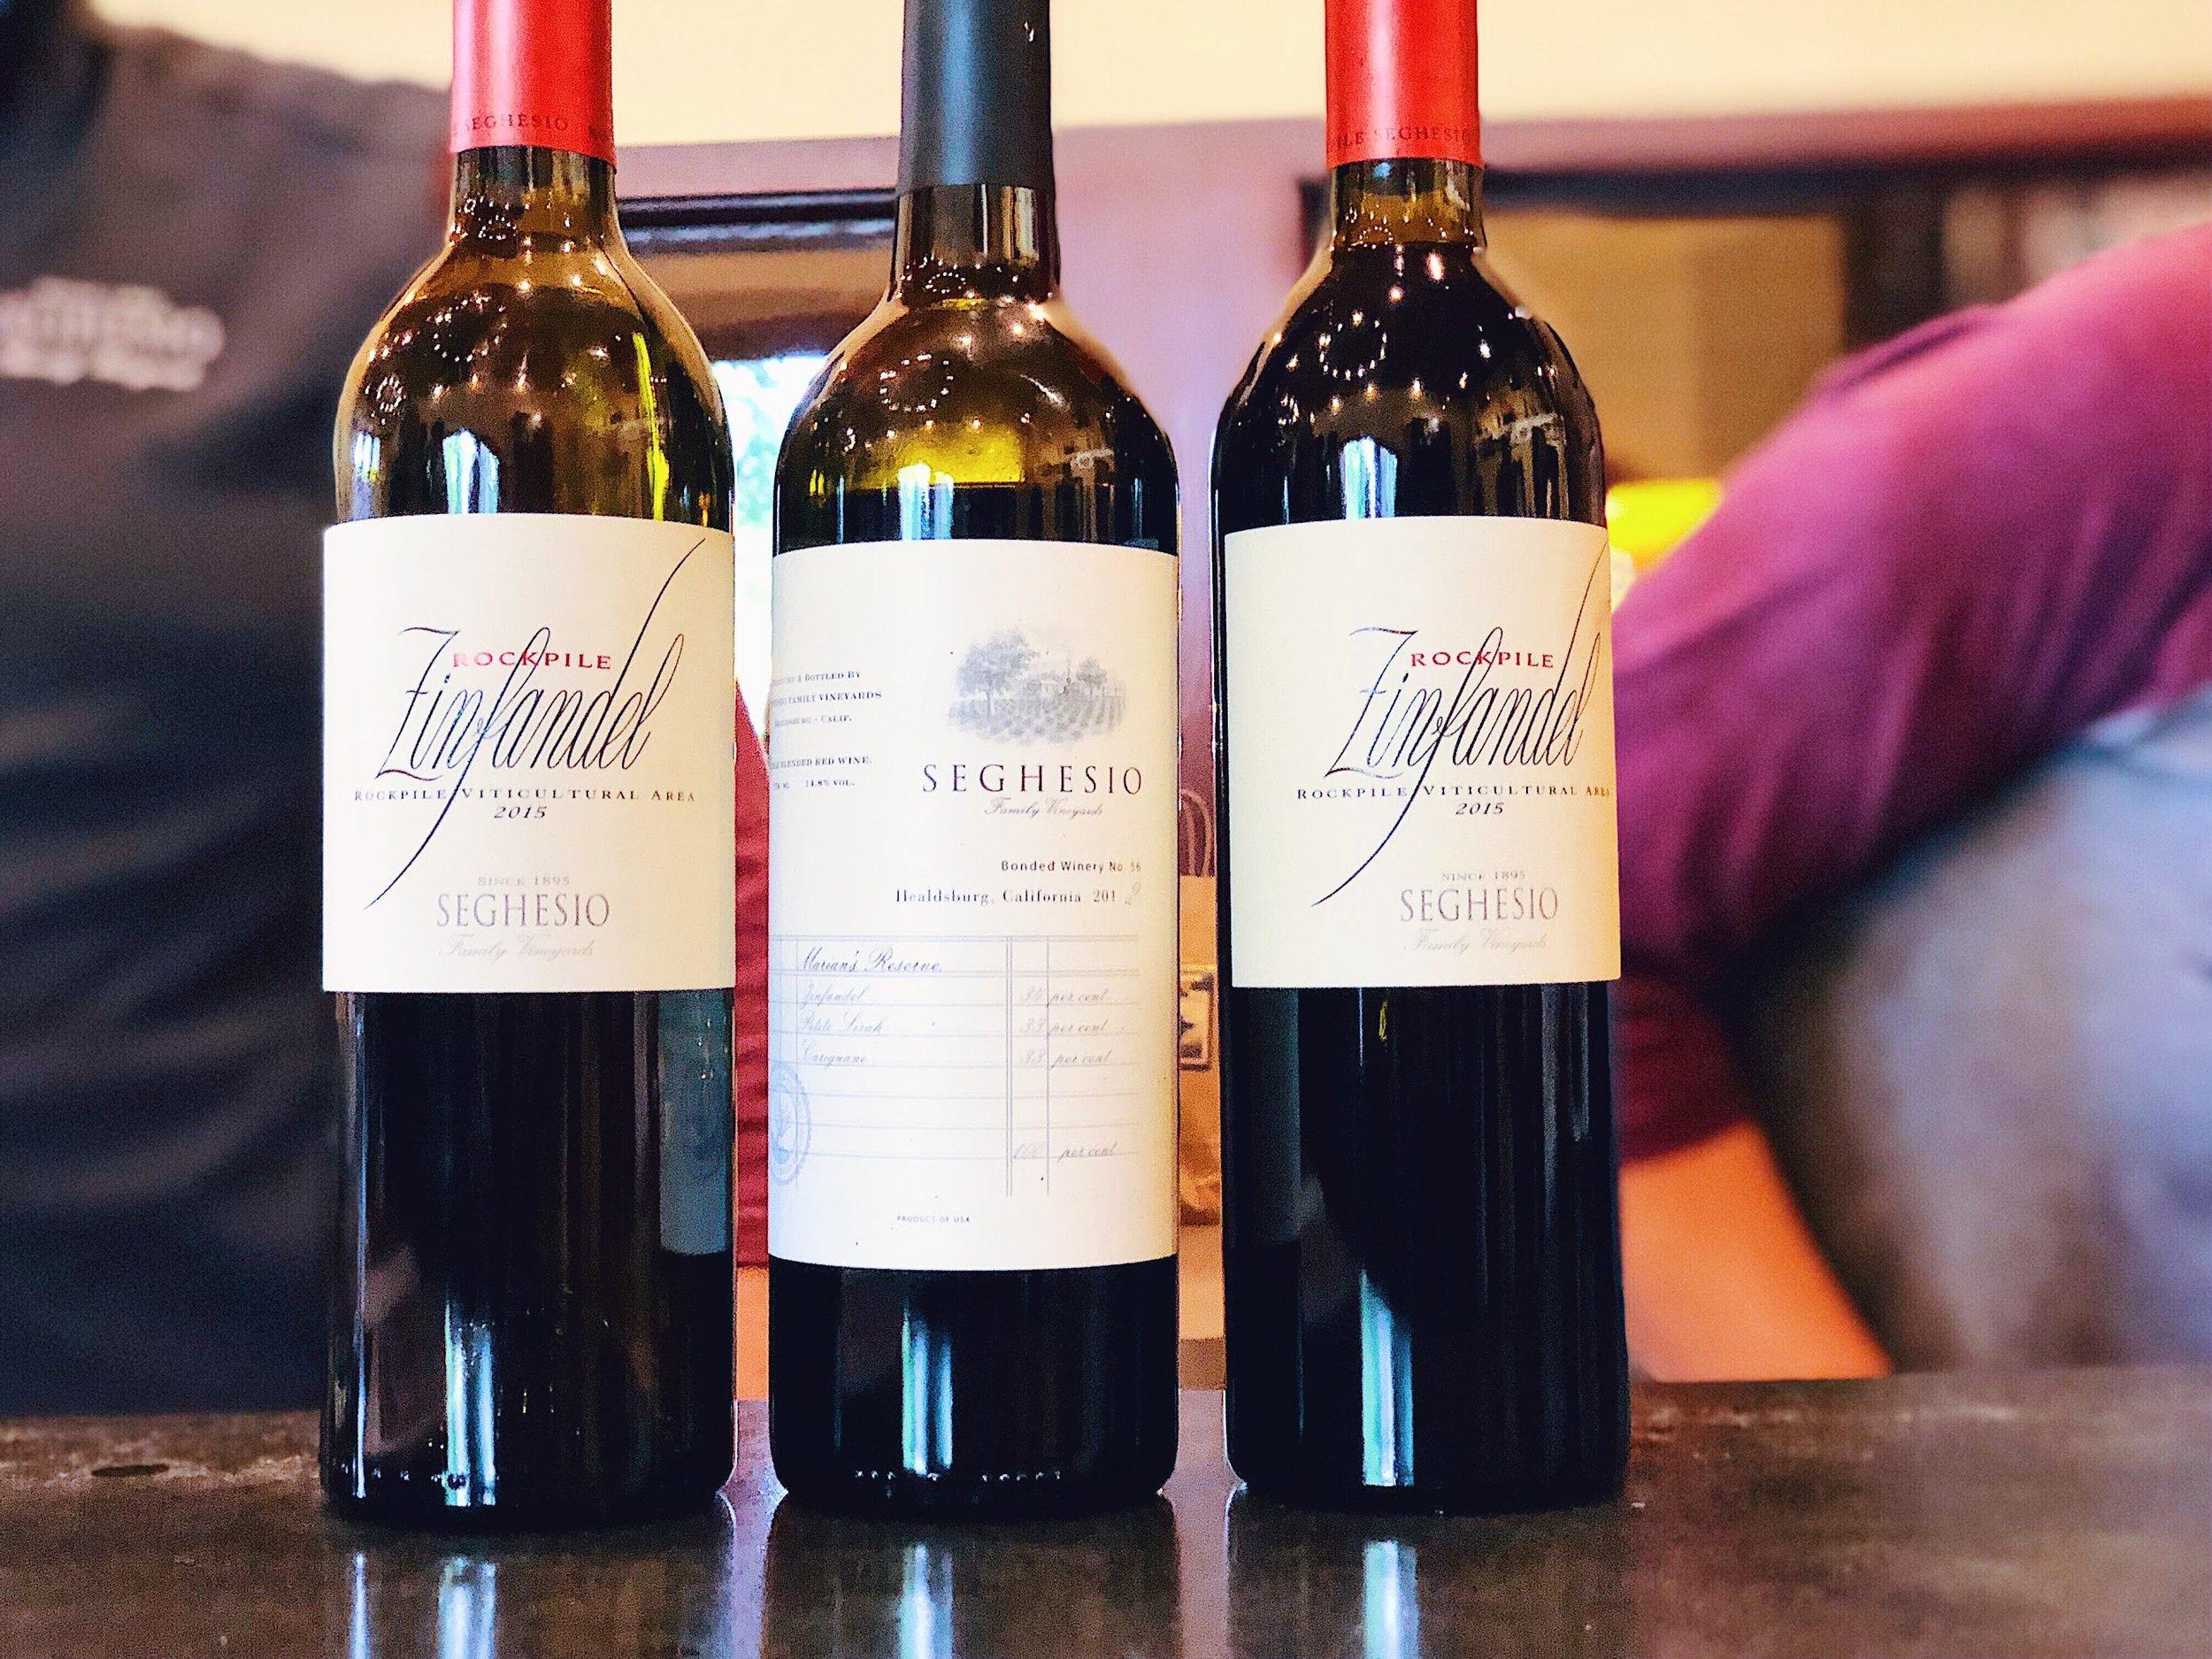 Seghesio Wine Bottles